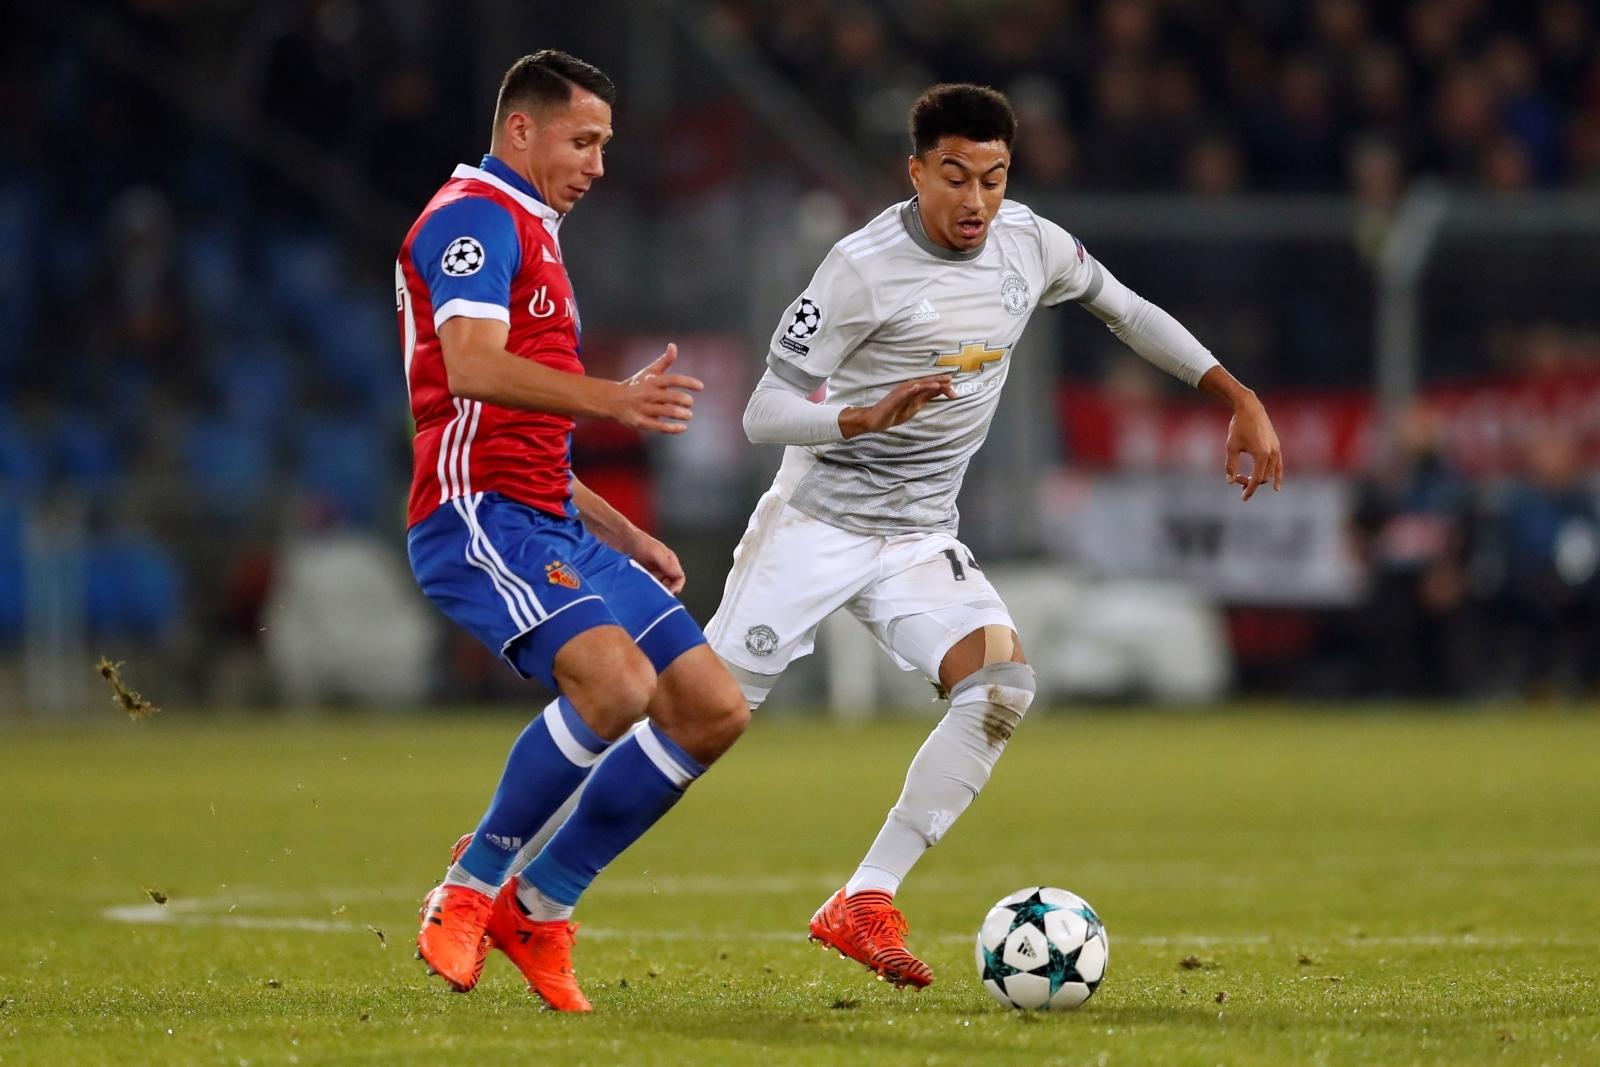 Basel vs Manchester United